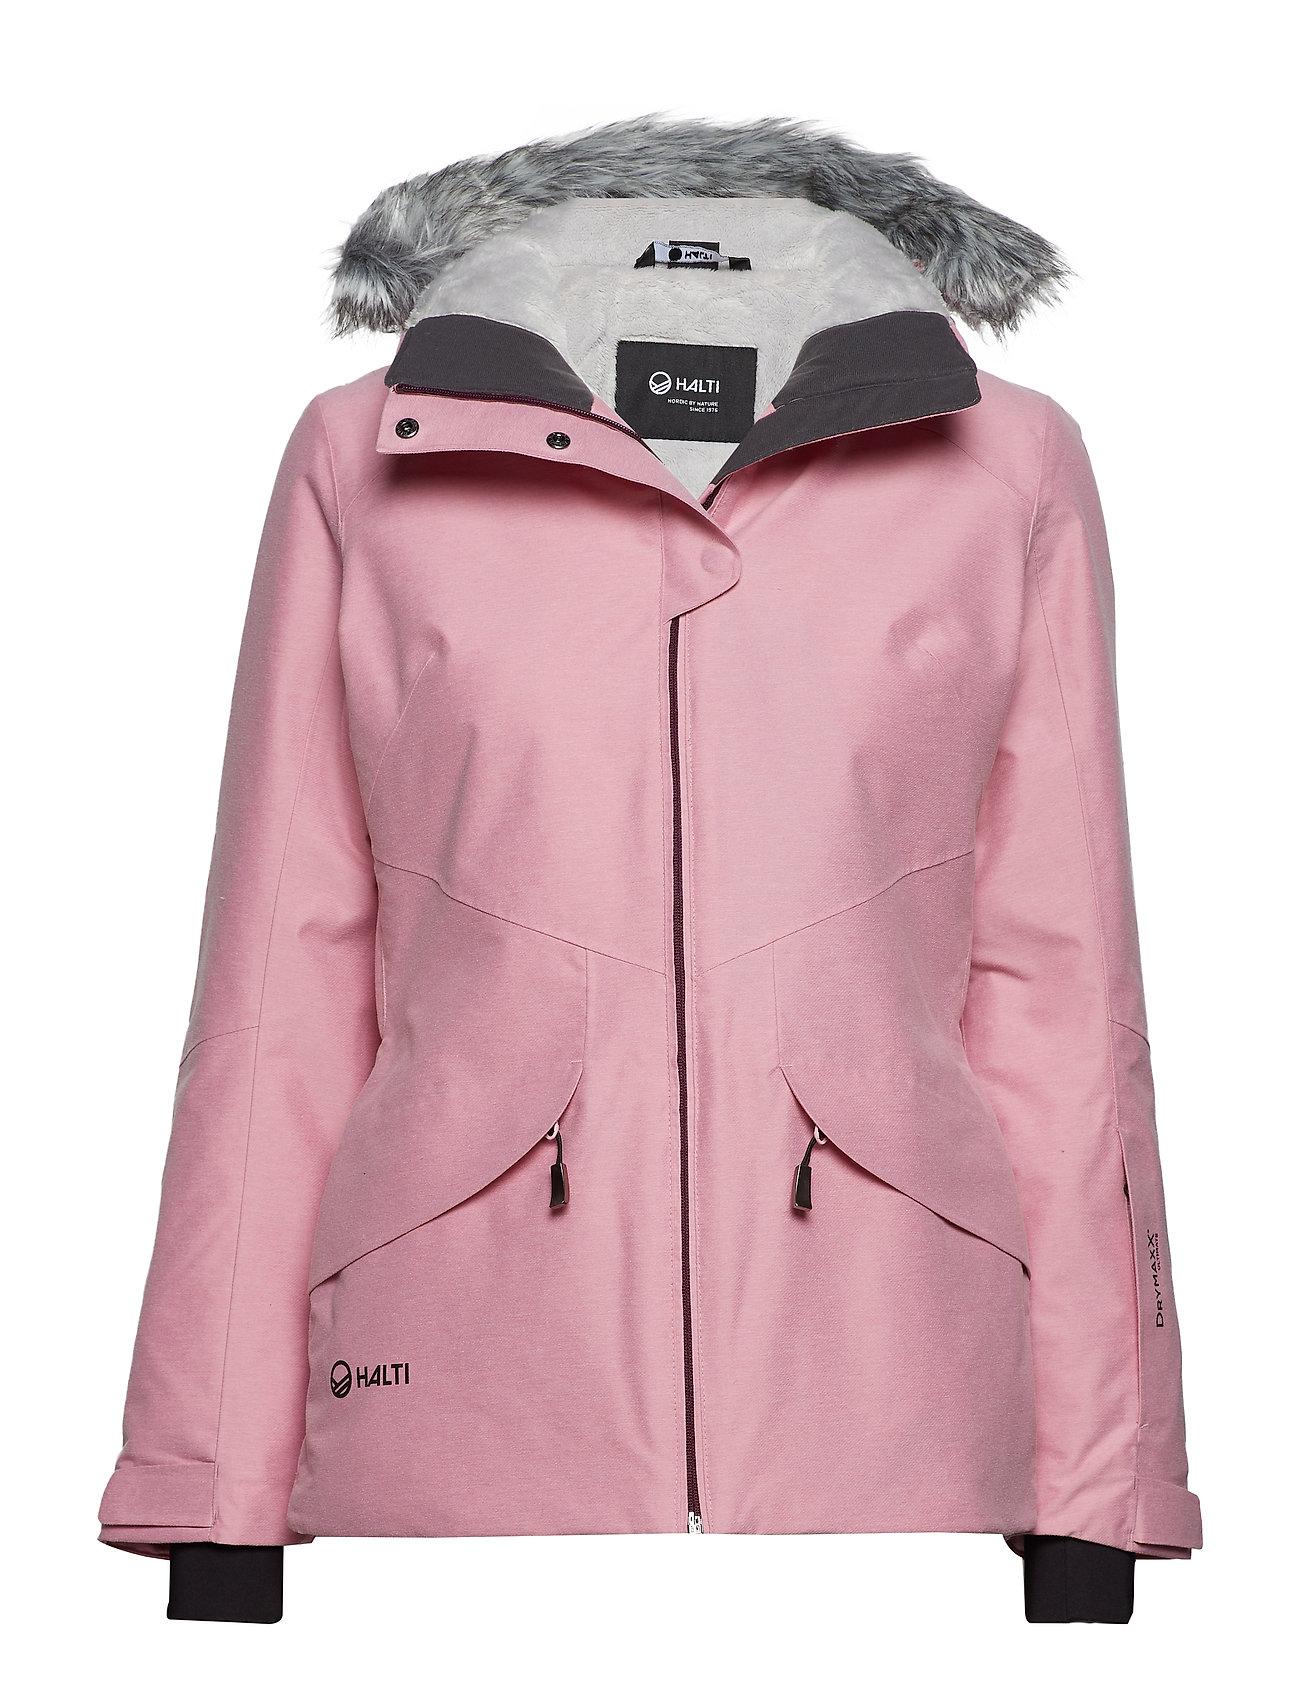 Halti Elega W DX ski jacket